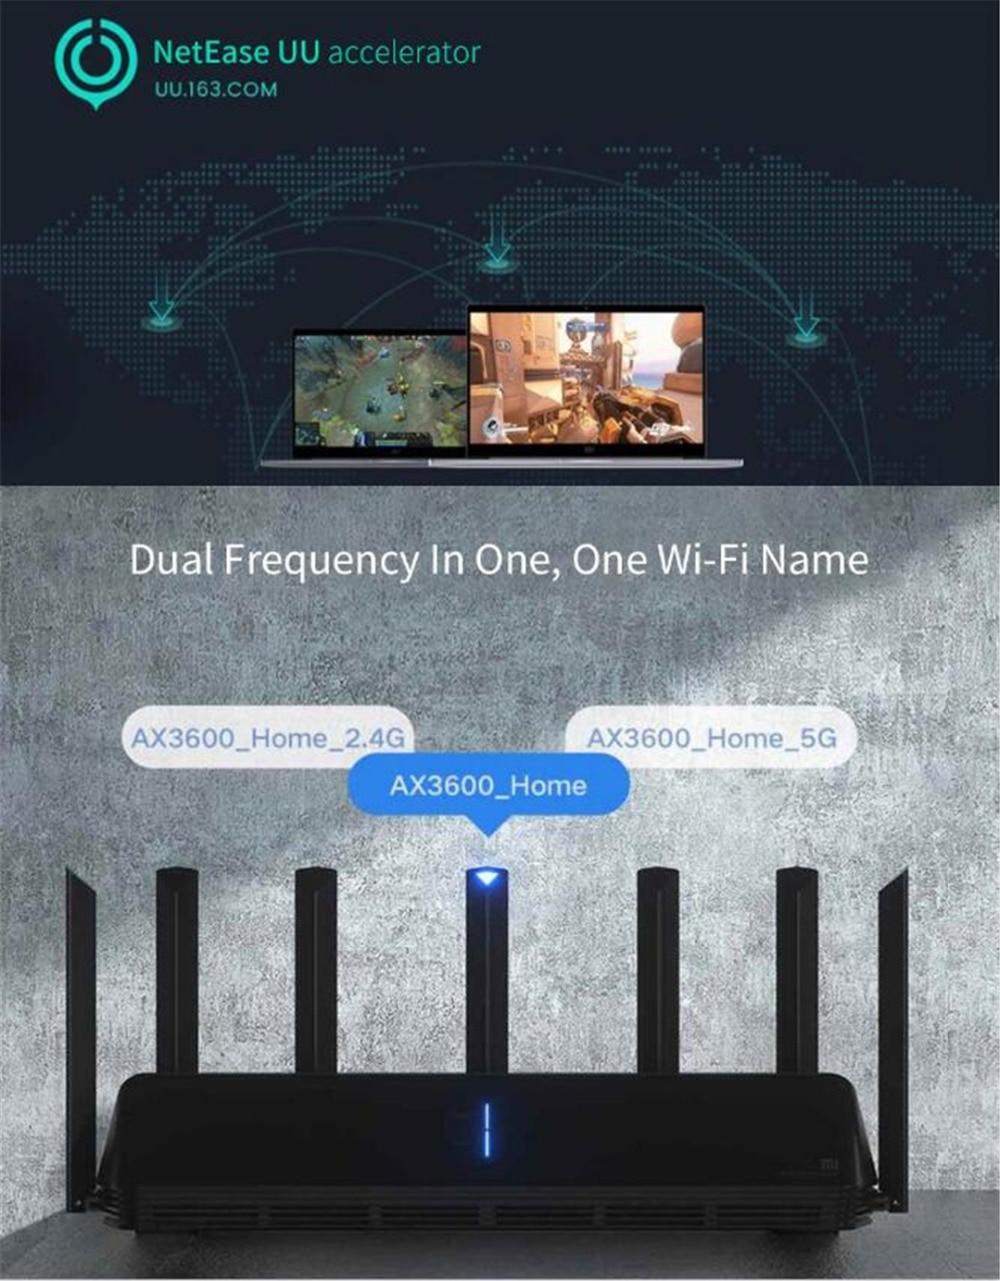 NEW Xiaomi AX3600 AIoT Router Wifi 6 5G Wifi6 600Mb Dual-Band 2976Mbs Gigabit Rate Qualcomm A53 External Signal Amplifier (20)